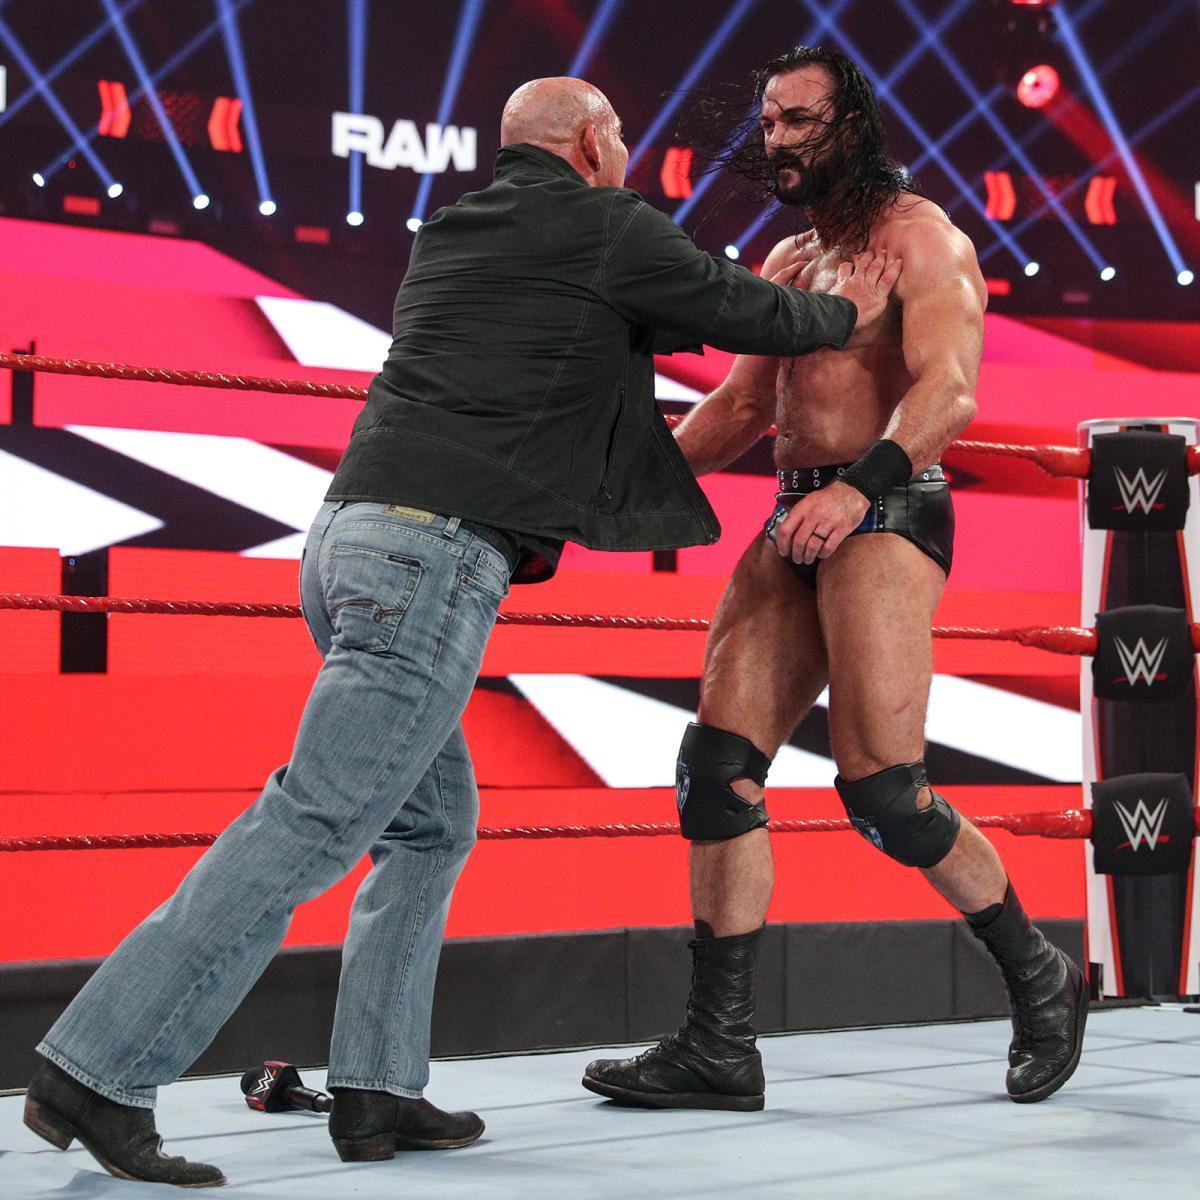 WWEヘビー級王者マッキンタイア(右)を突き飛ばすゴールドバーグ(C)2021WWE,Inc.AllRightsReserved.